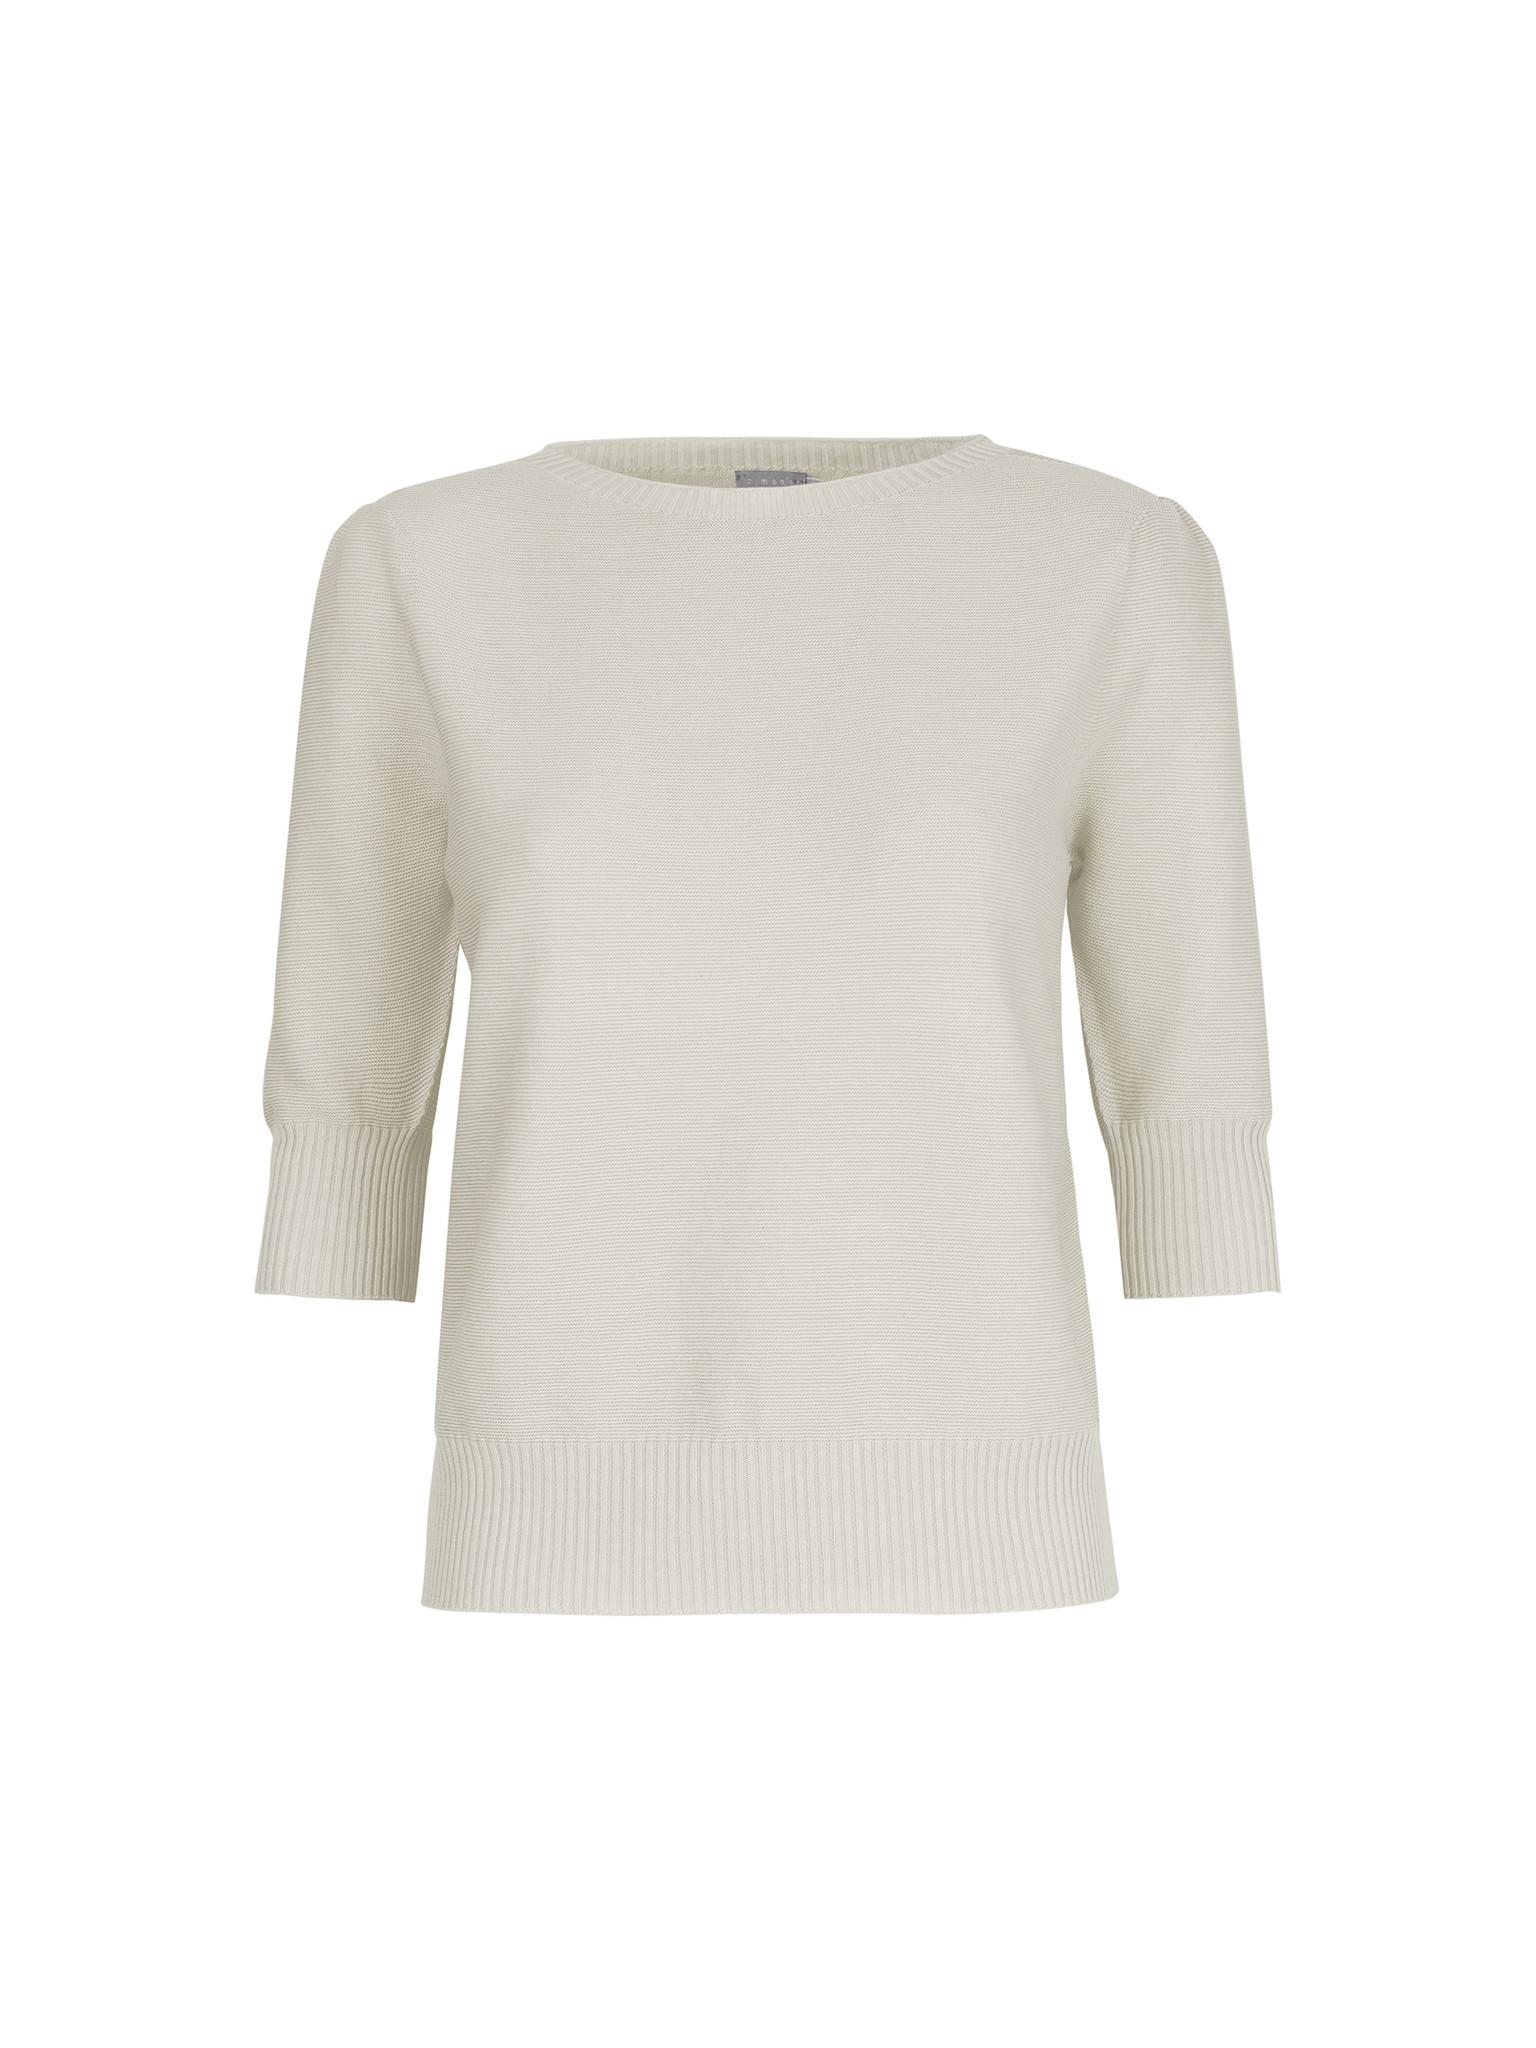 nomansland sweater 55.112-1